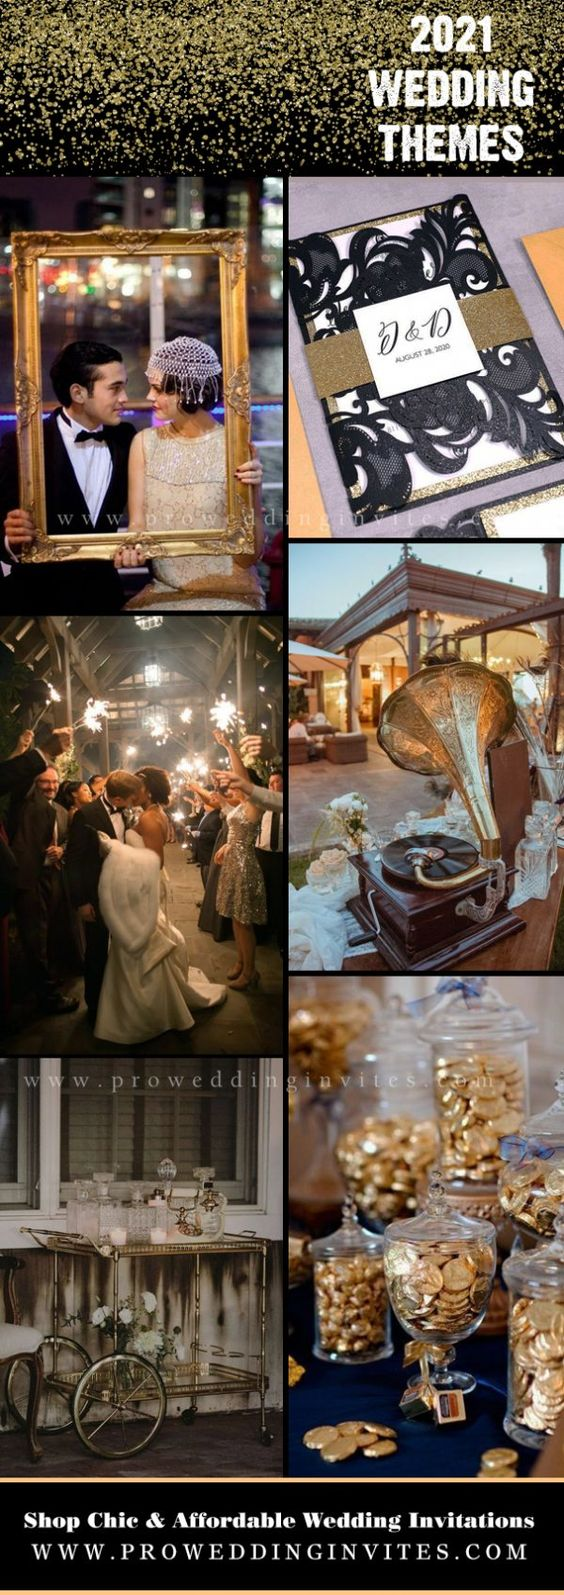 Moonlight-themed Luxury celestial black and gold wedding Invitations